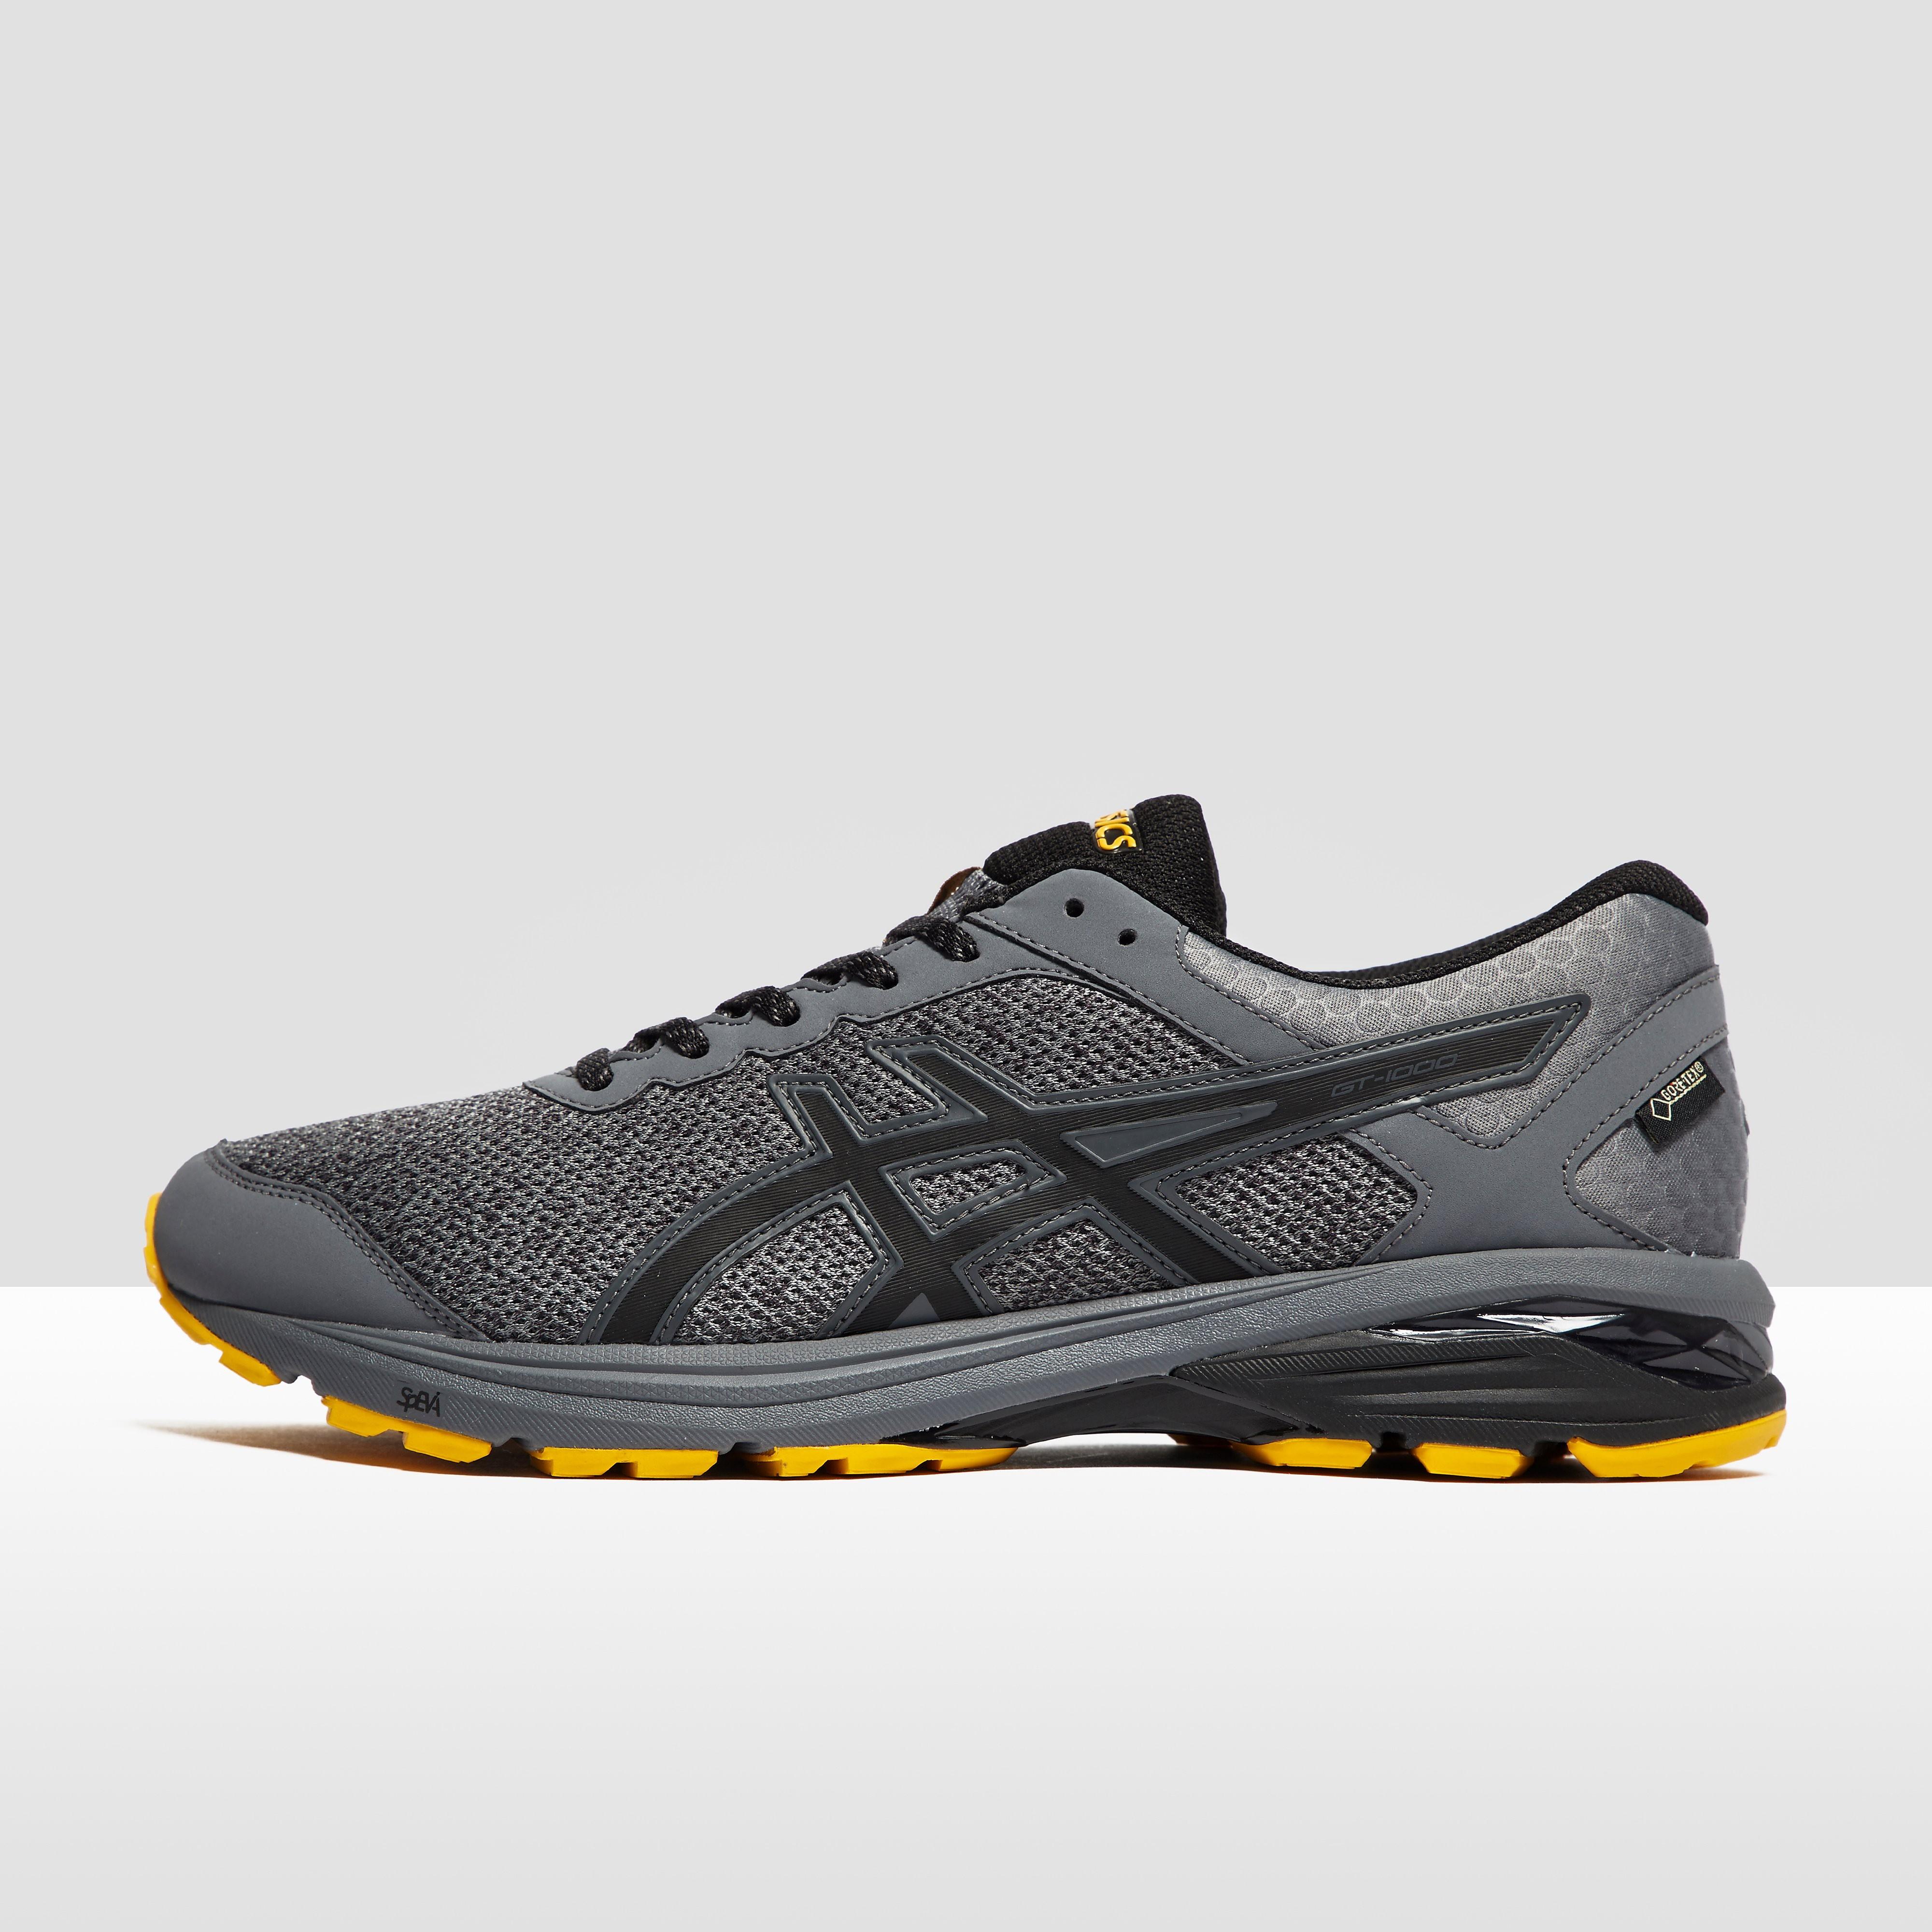 ASICS GT-1000 6 G-TX Men's Running Shoes